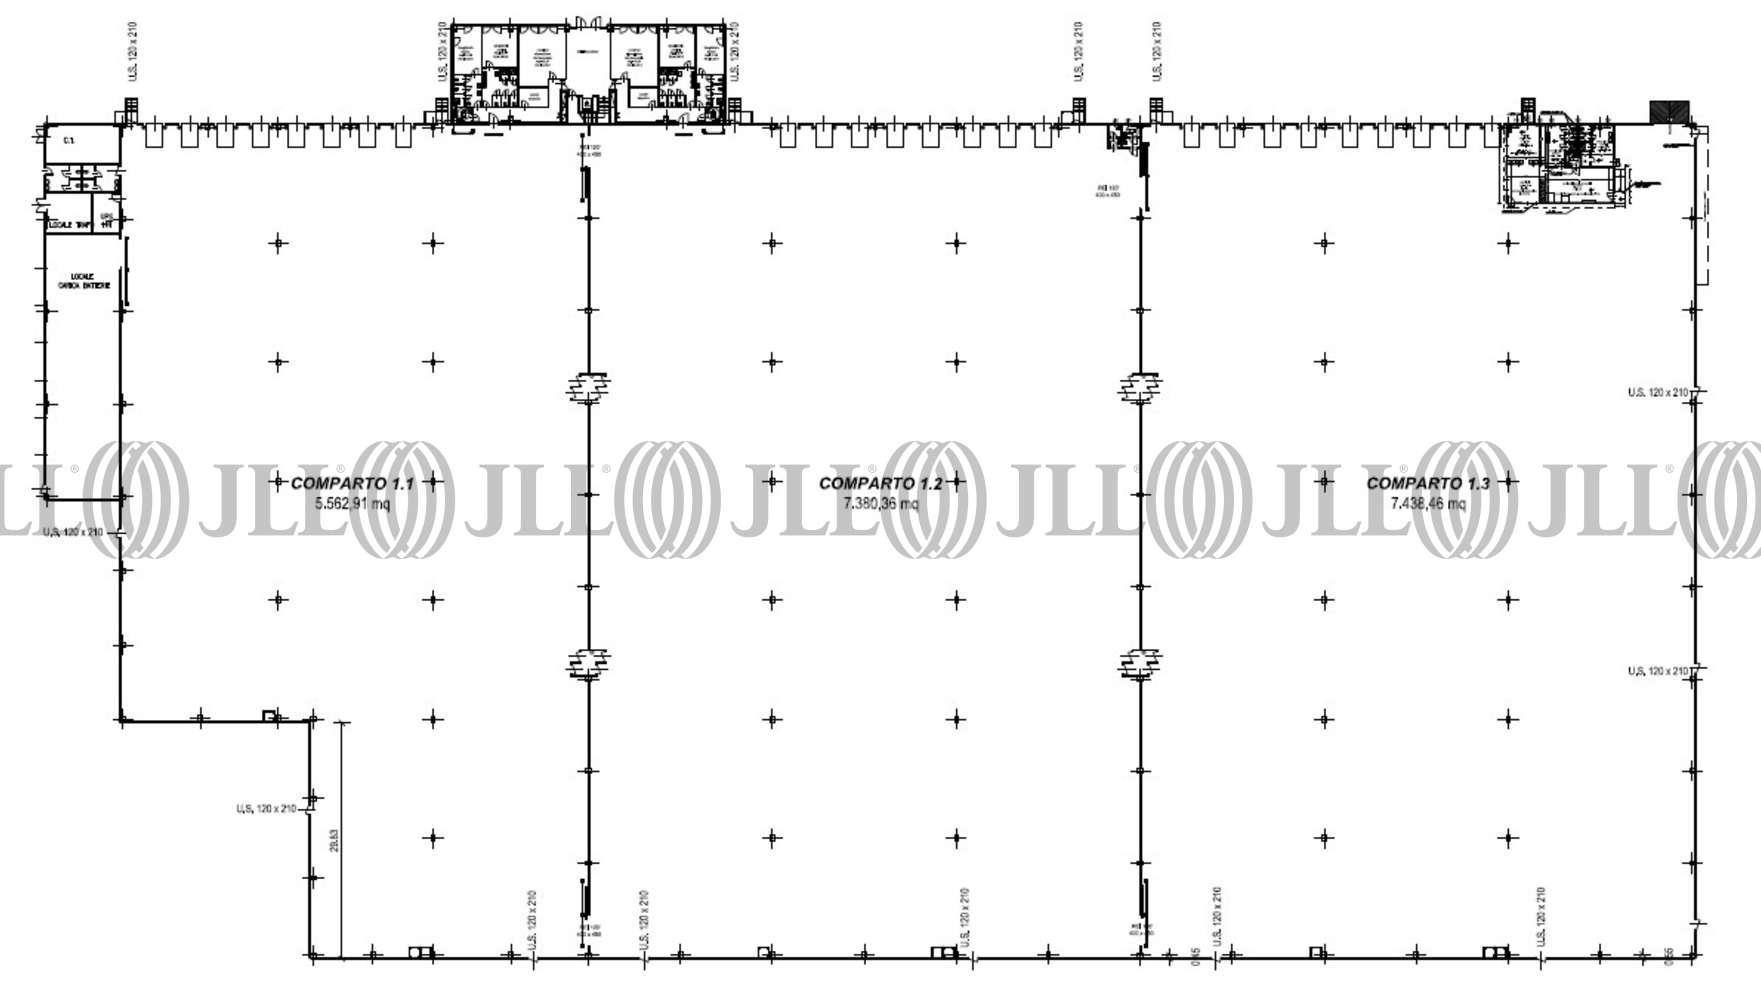 Magazzini industriali e logistici Castel san pietro terme, 40024 - Castel San Pietro Terme (BO)